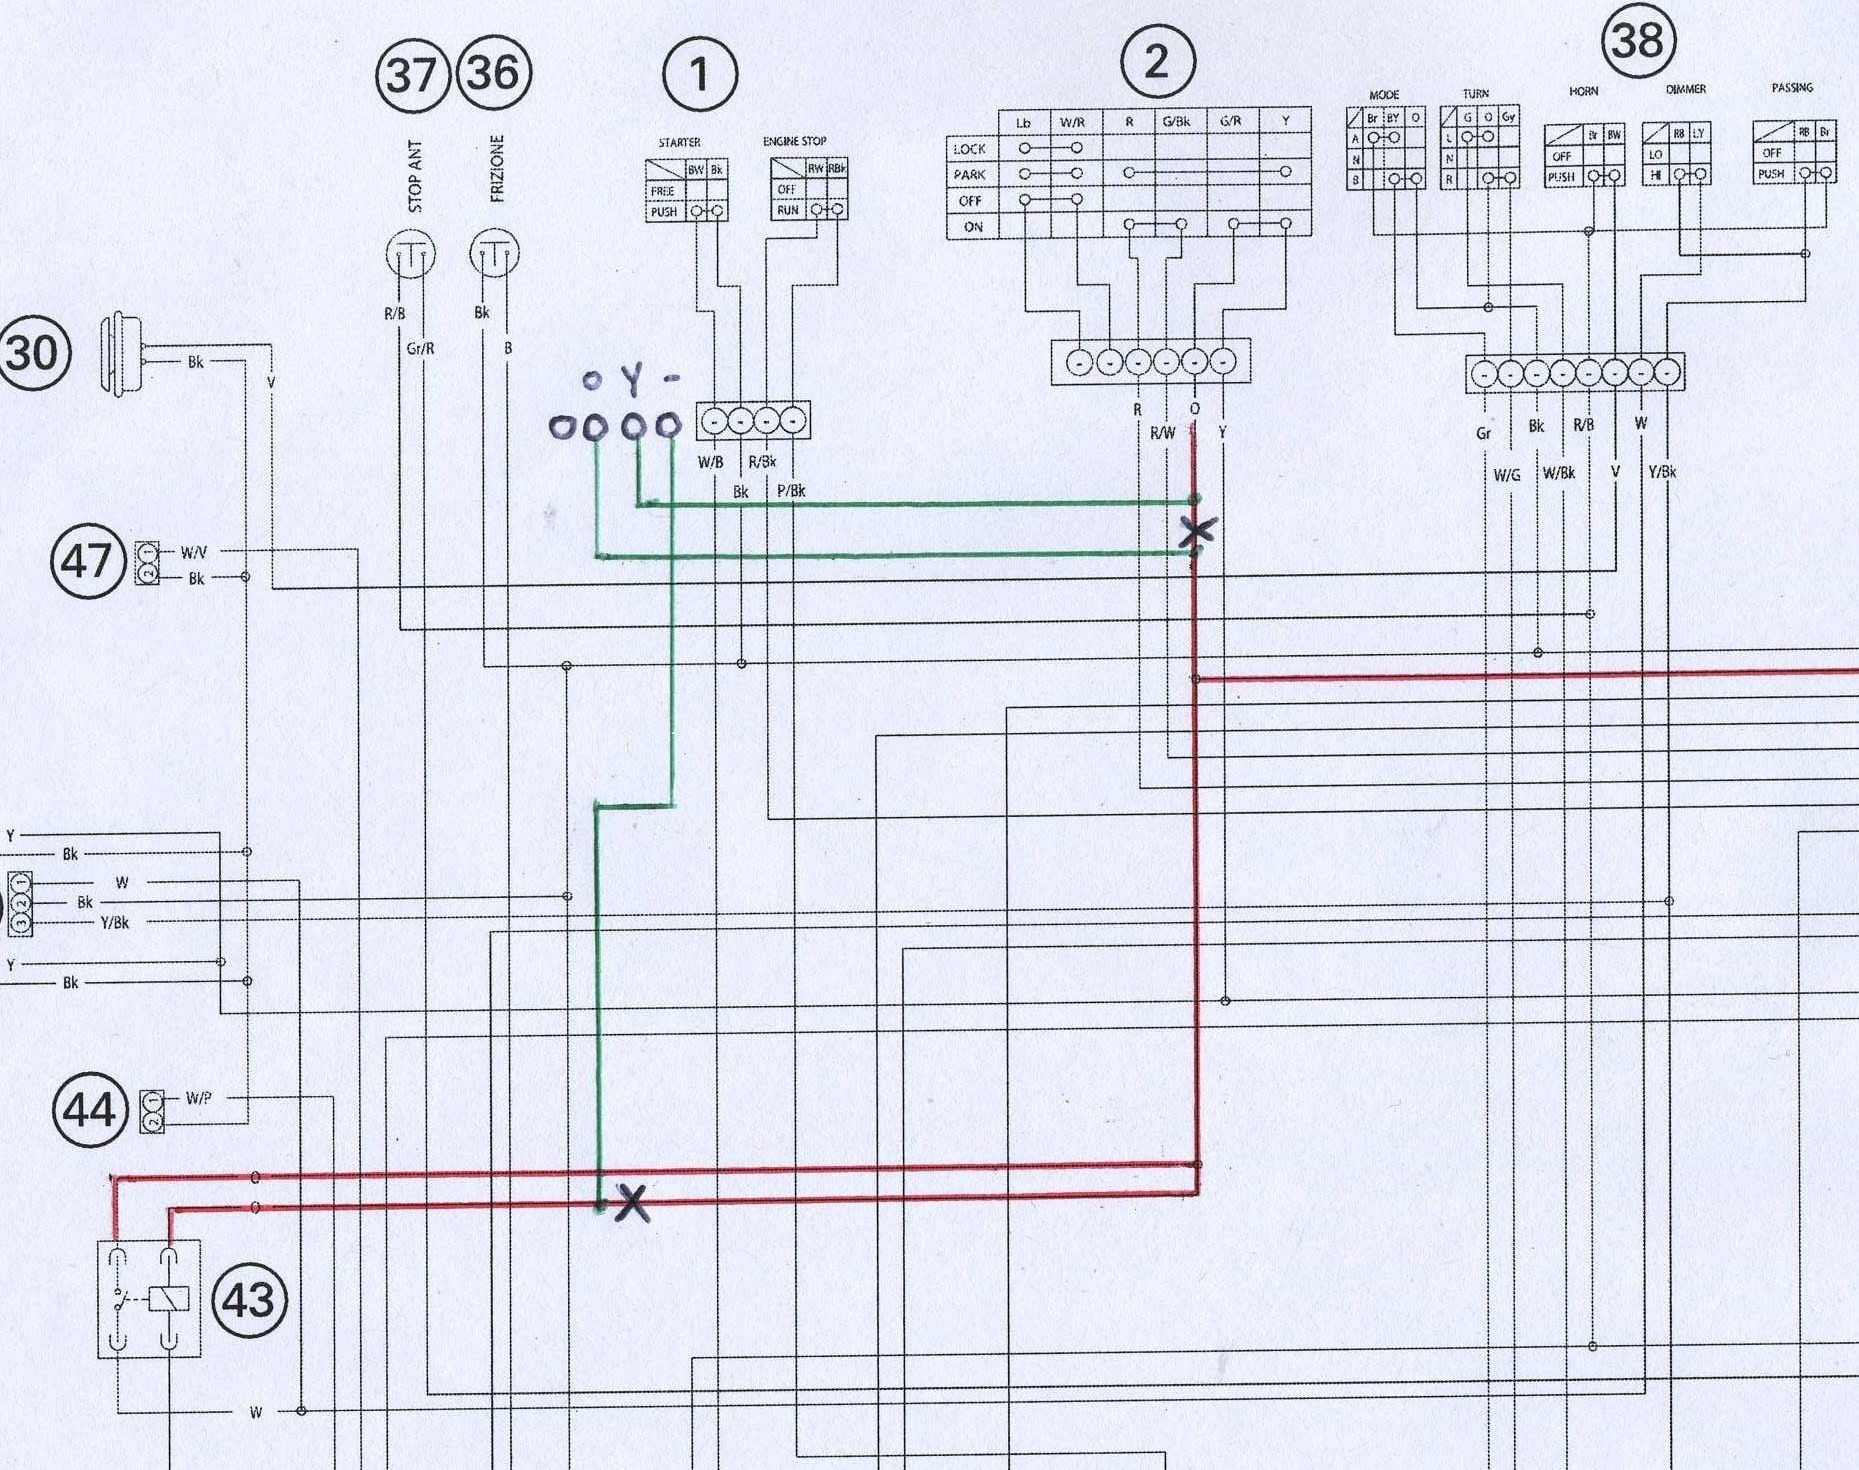 obd2 wiring diagram gm 1996 civic alarm obd best library ducati 848 ecu simple rh 17 terranut store 2003